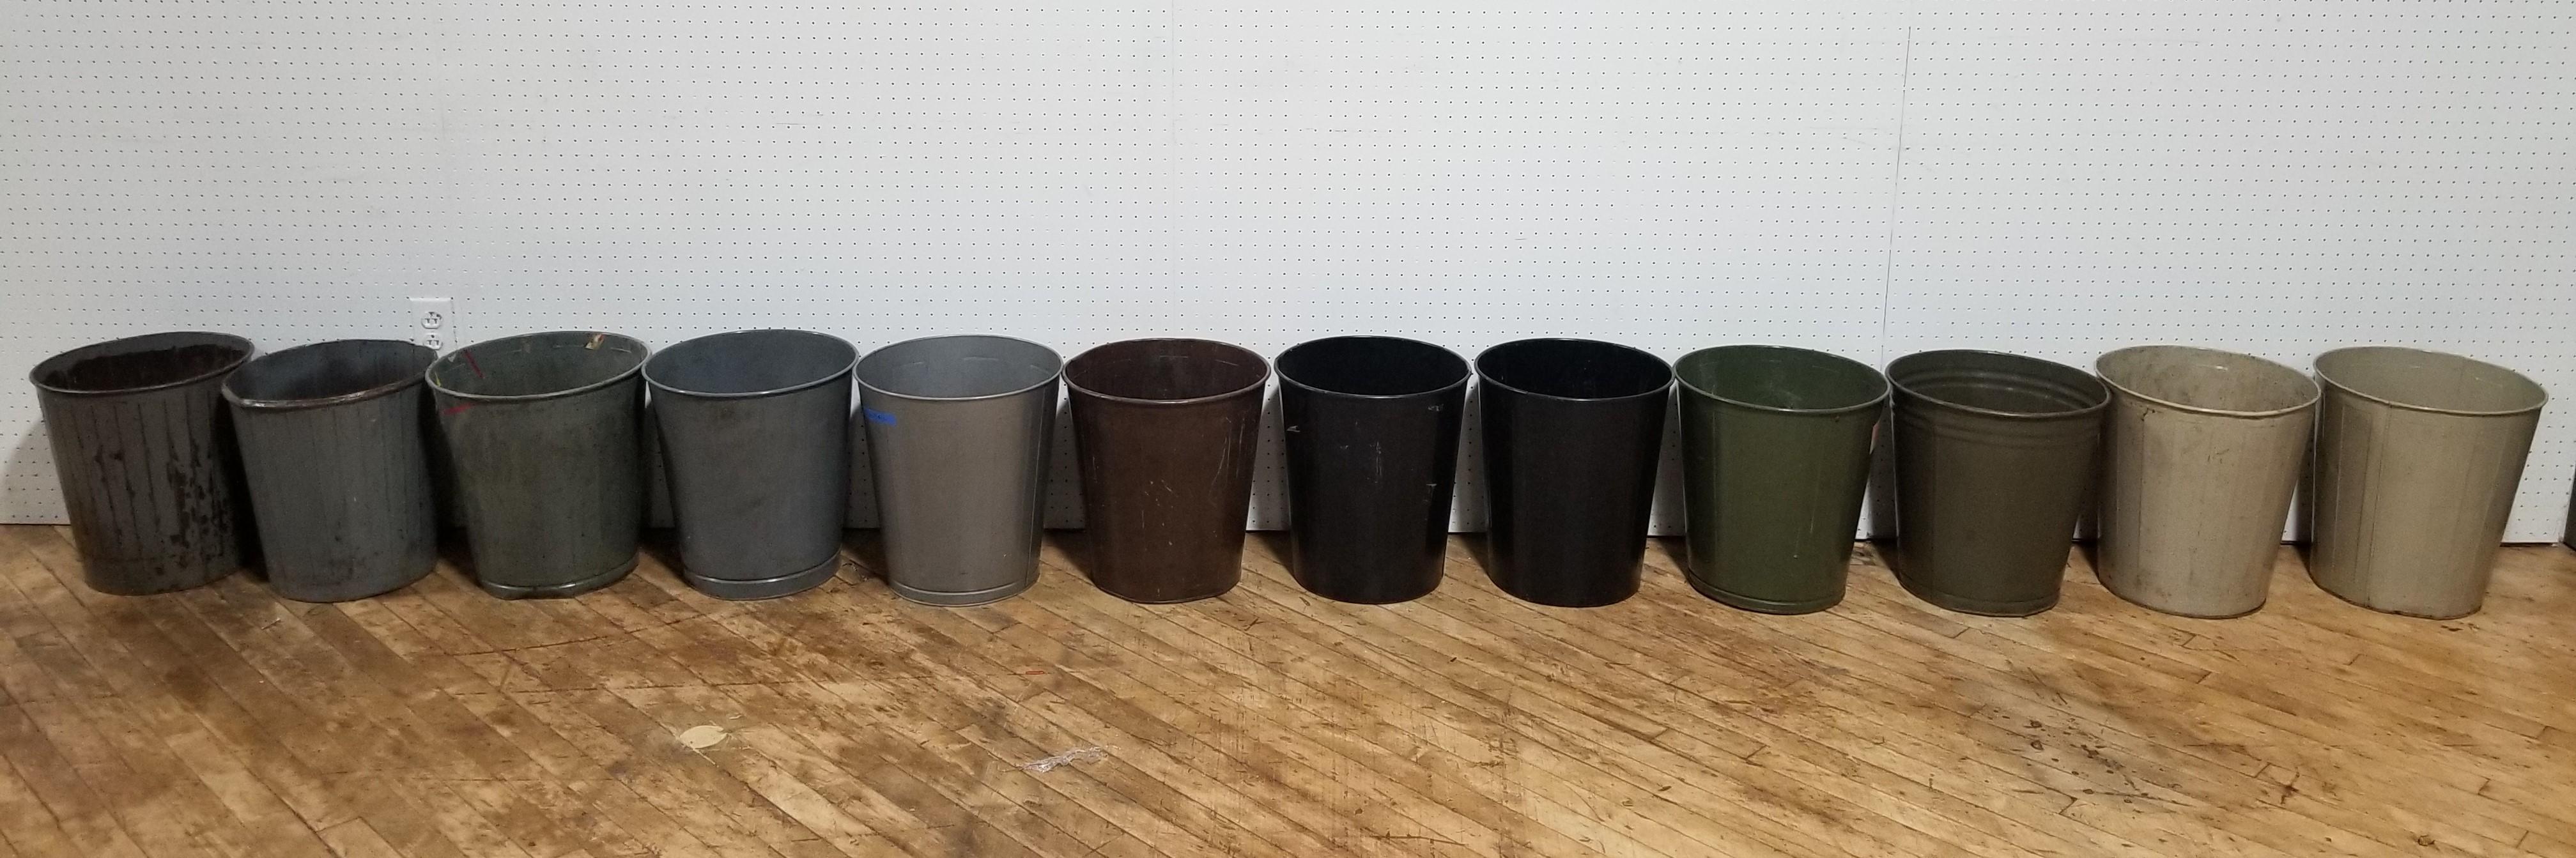 #108. Vintage Metal Trash Cans